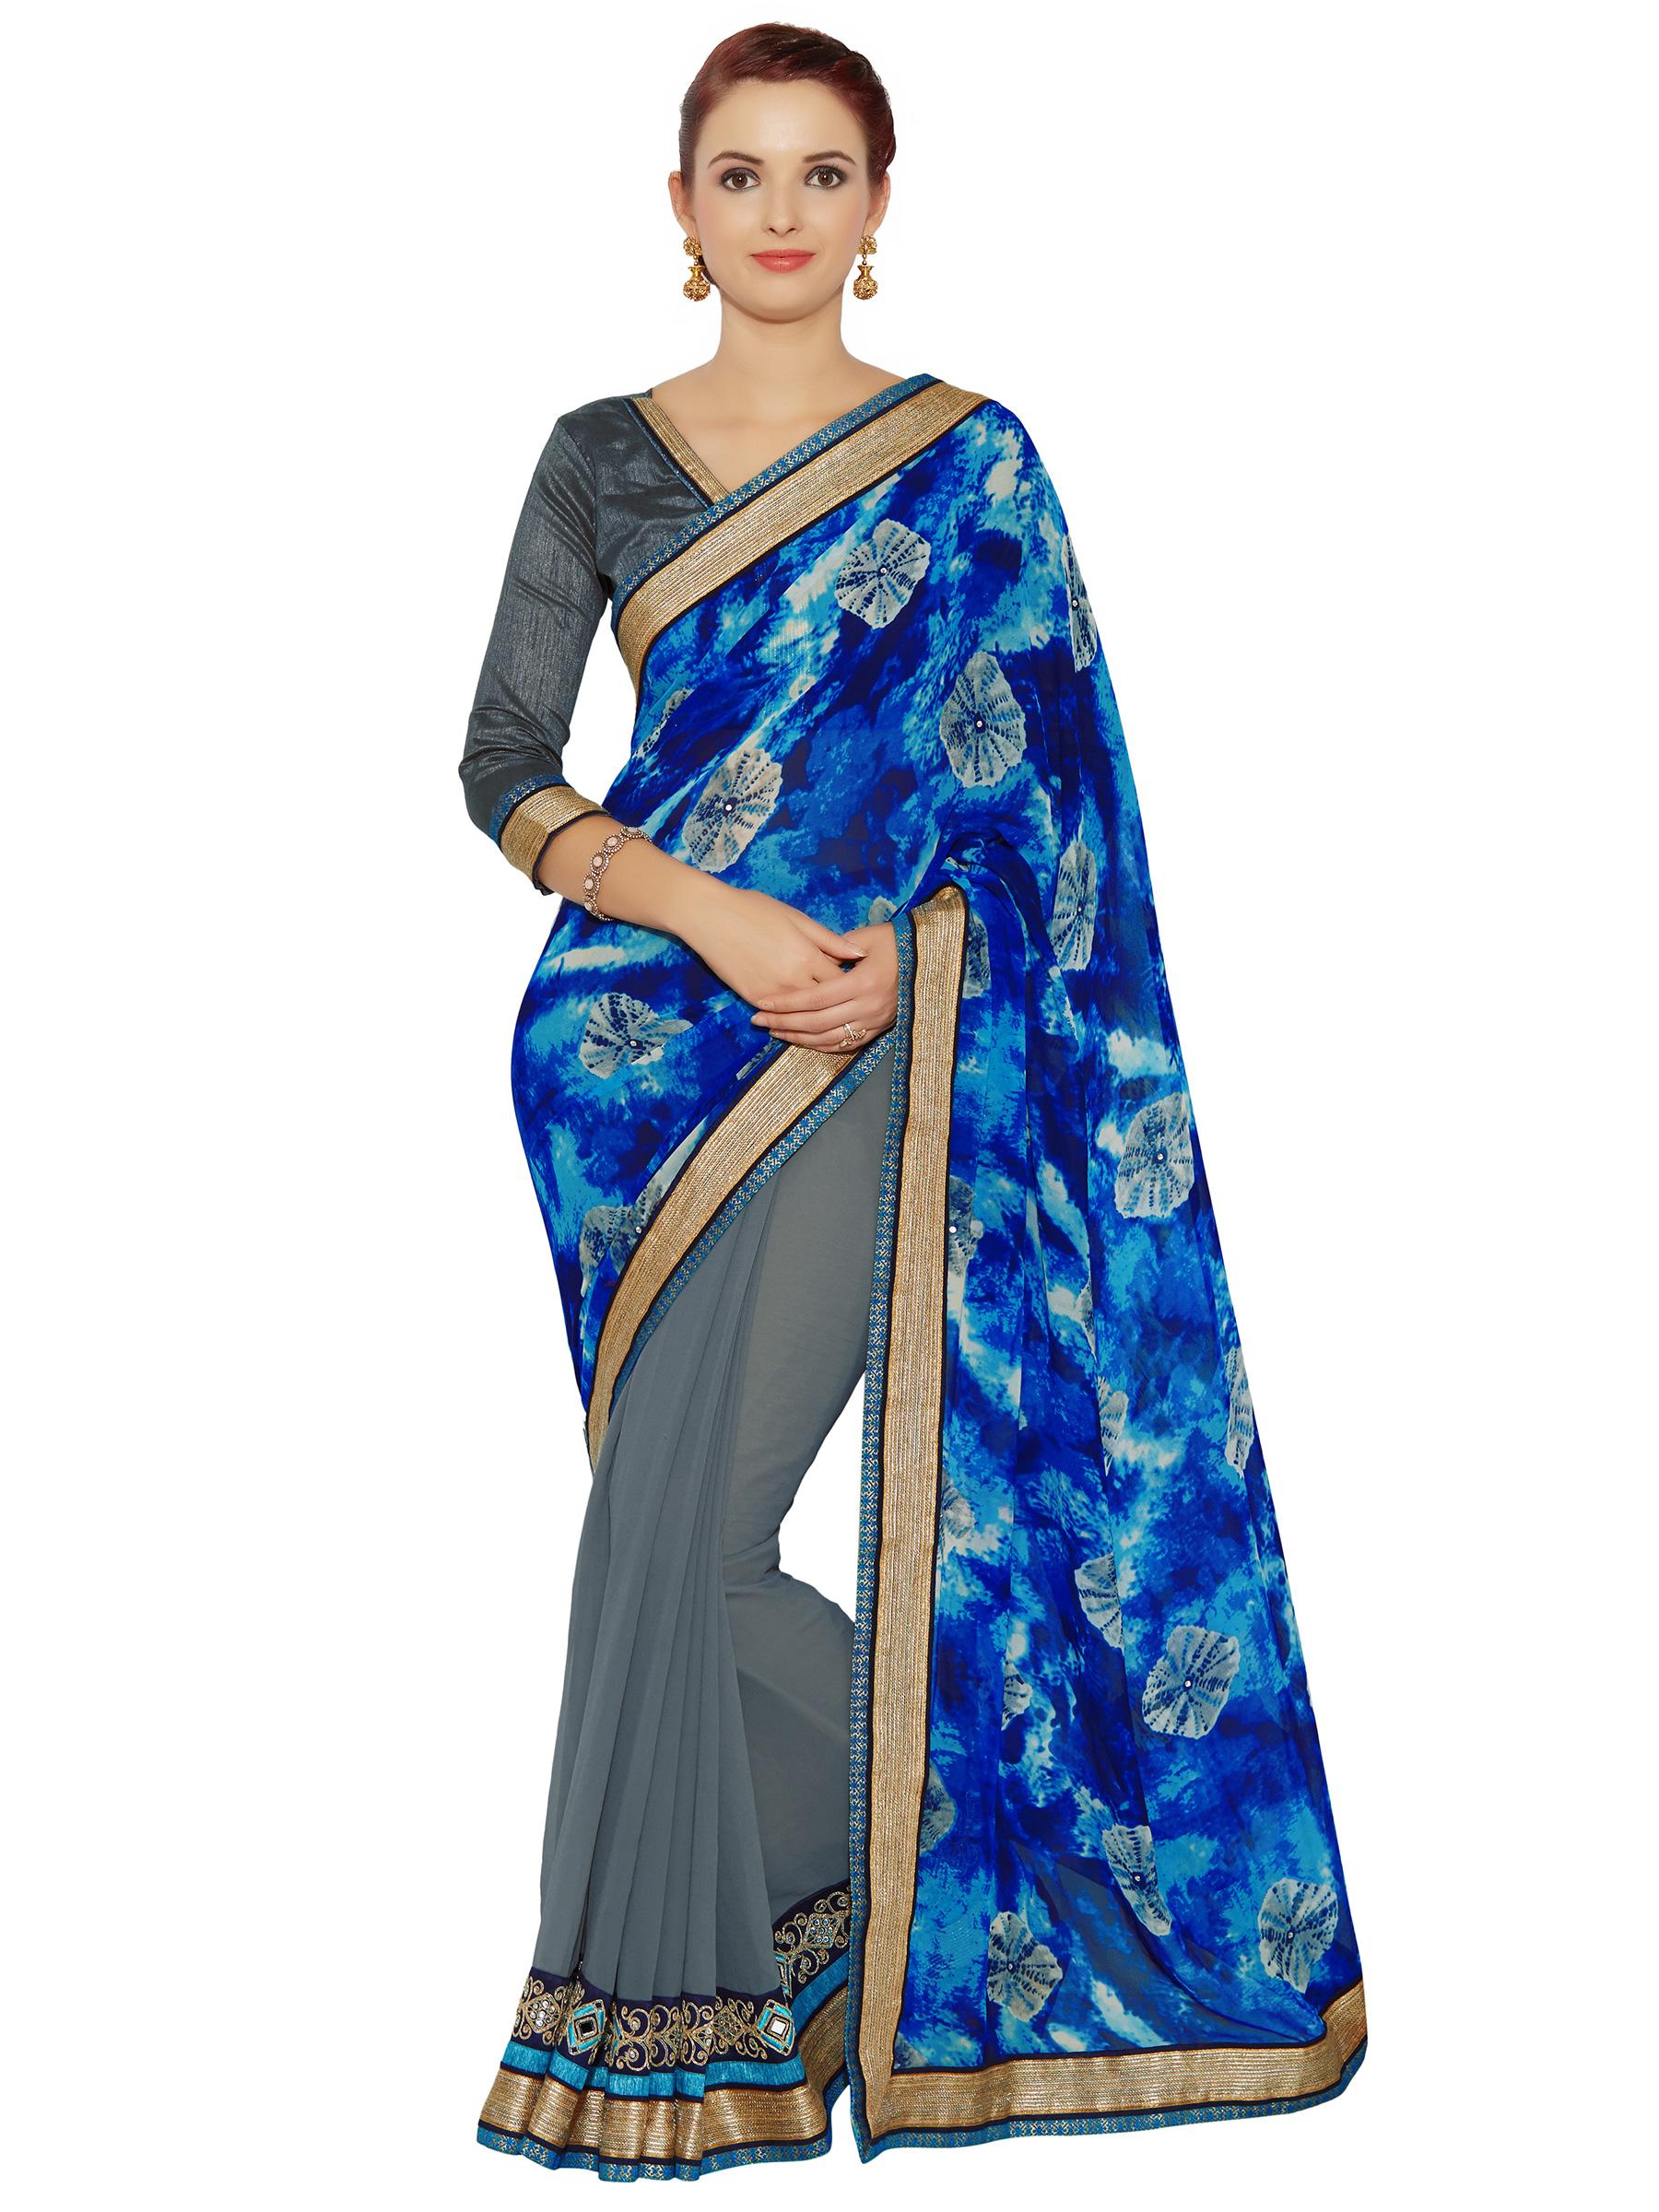 bc6bba9449f Indian women Blue Half and Half Sari and Digital Prints Raw Silk saree with  blouse - Indian Women Fashions Pvt Ltd - 2479929